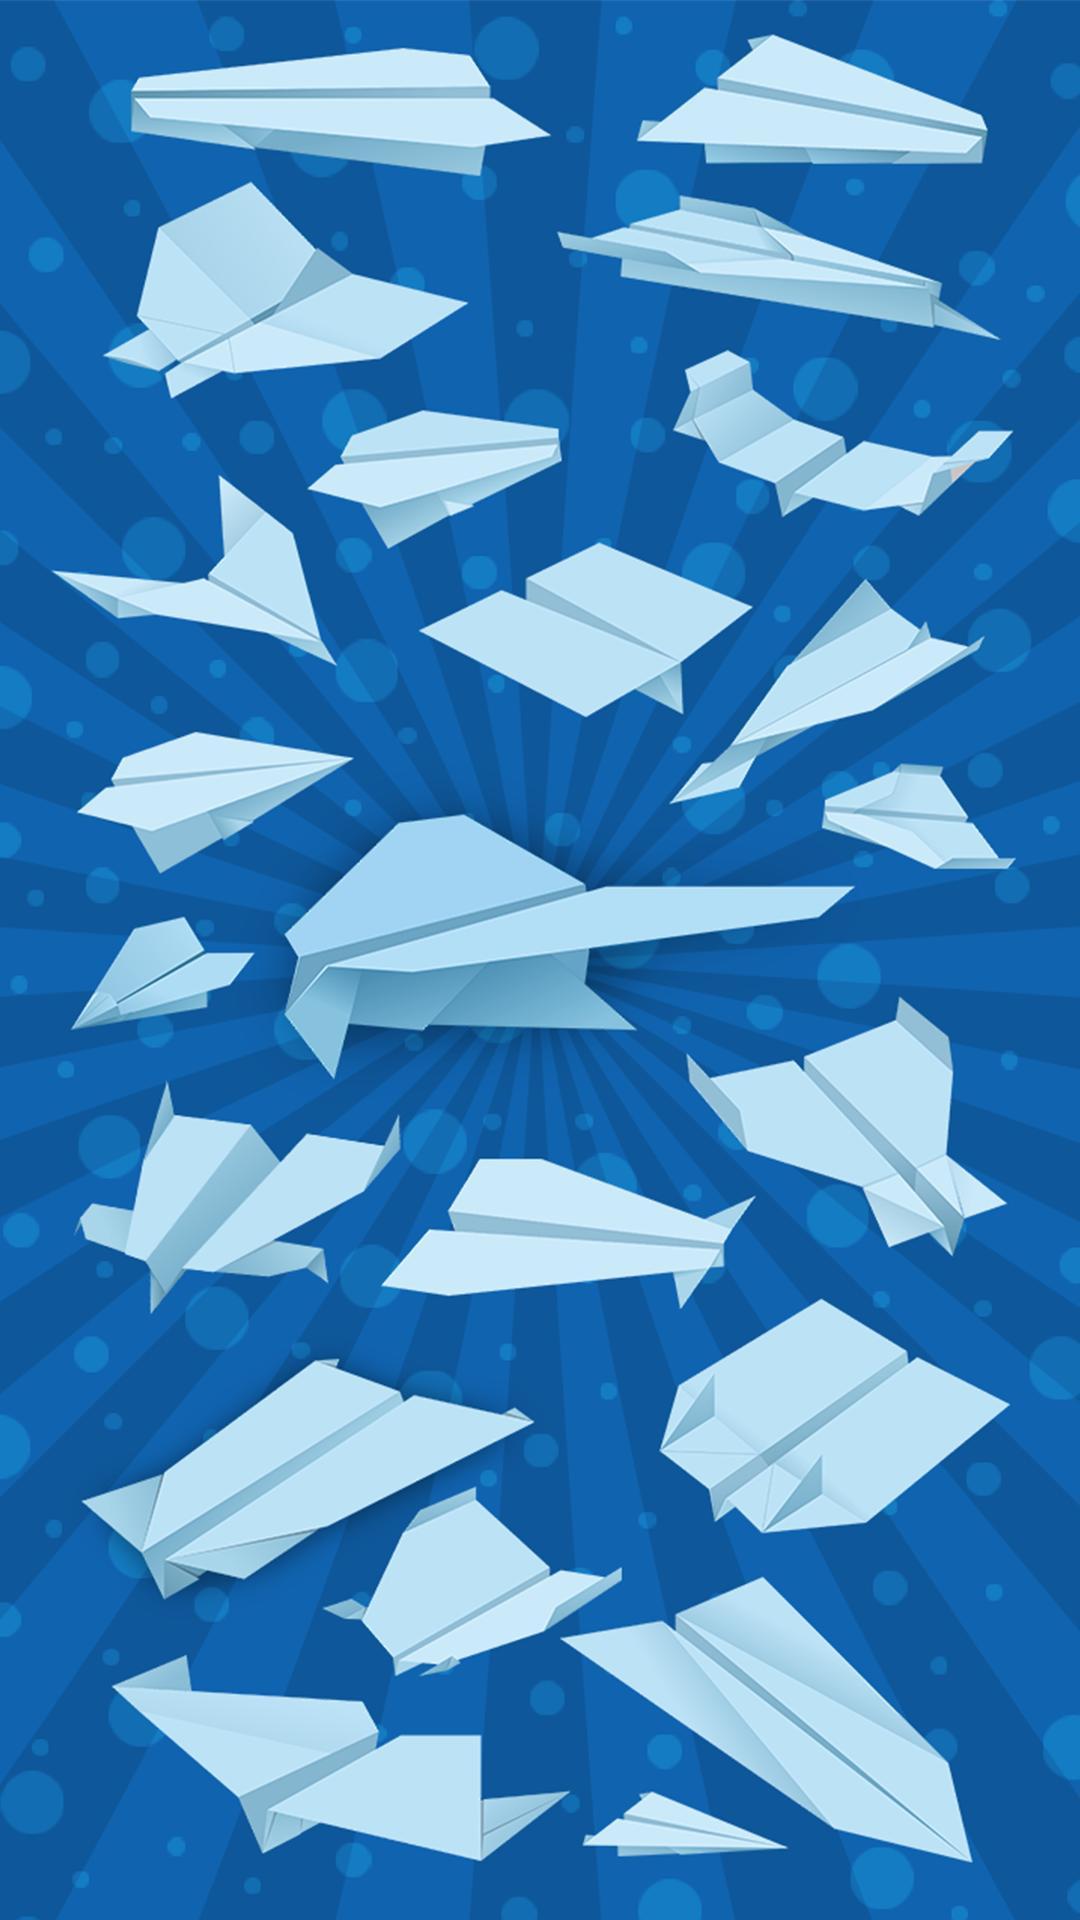 Origami Screen-Print Mizudama 15 cm, 3,51 € | 1920x1080